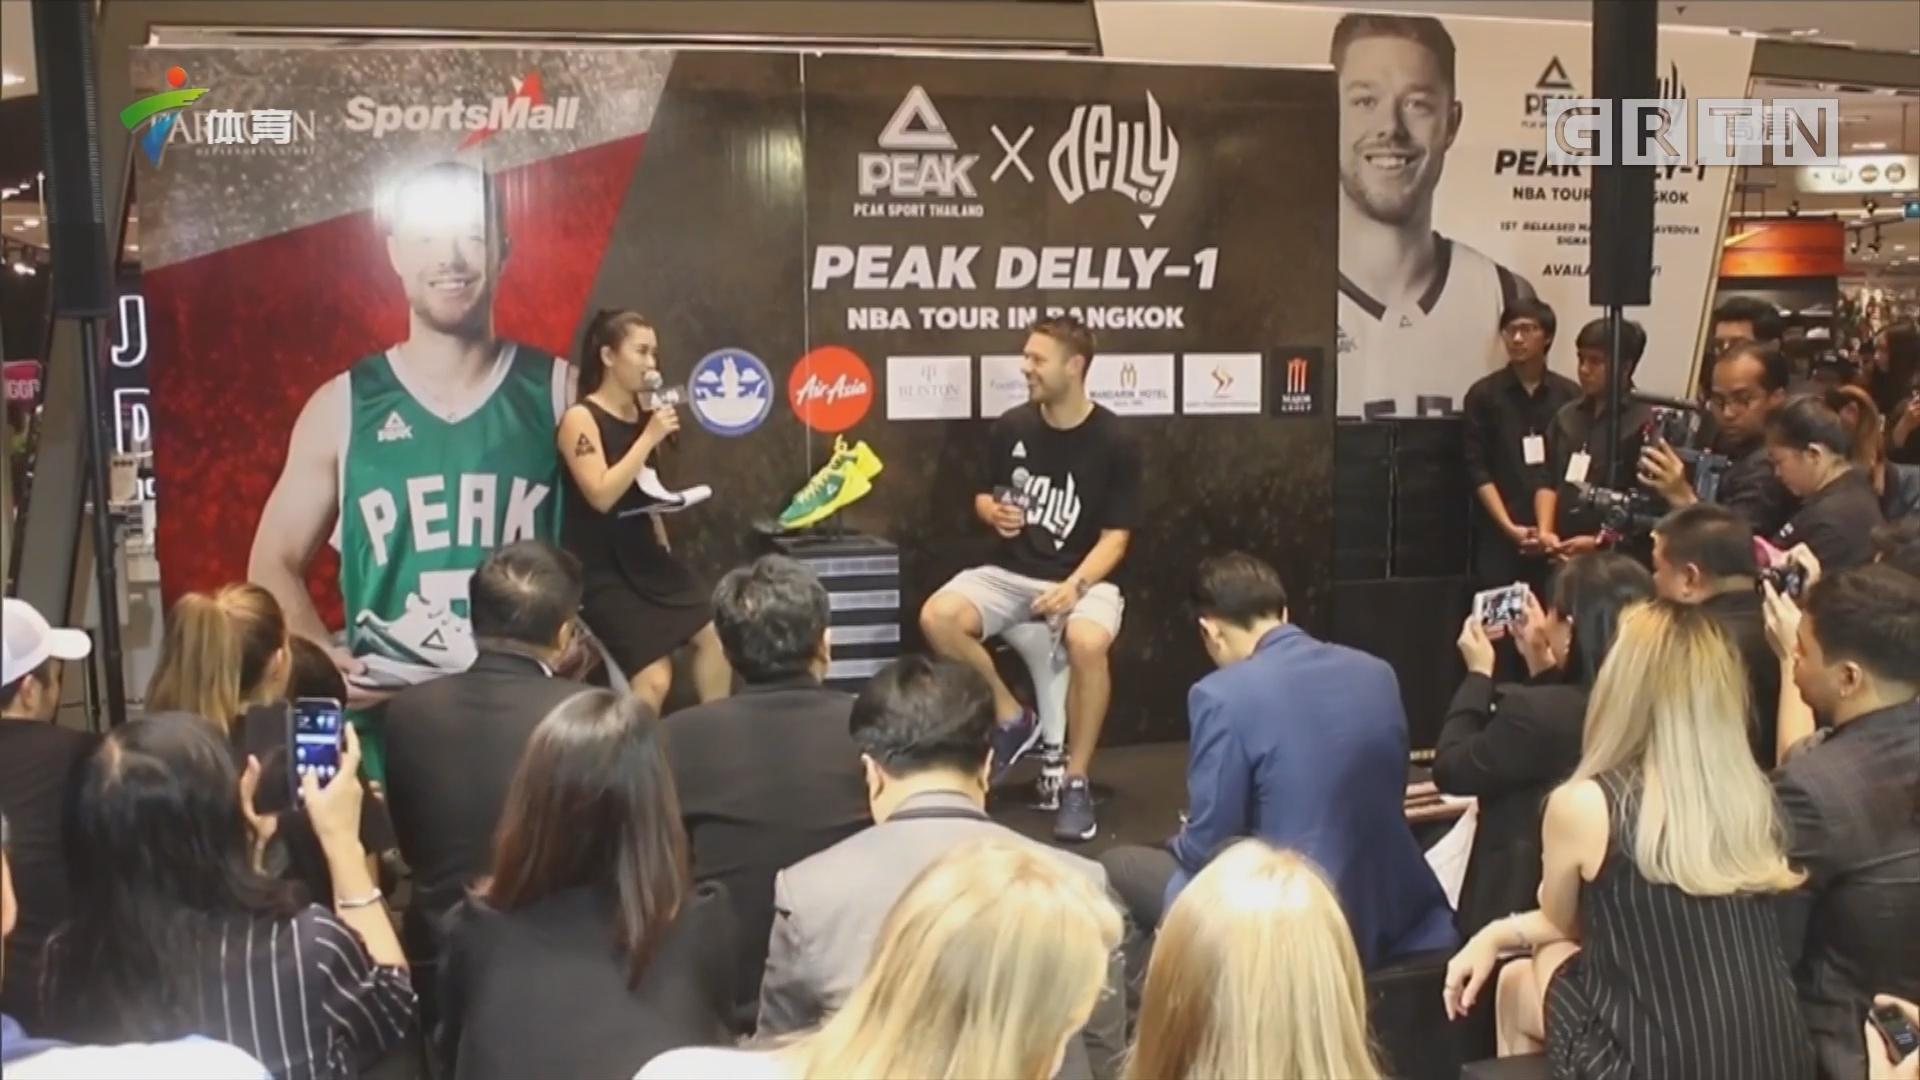 NBA球星马修·德拉维多瓦助力中国运动品牌国际化